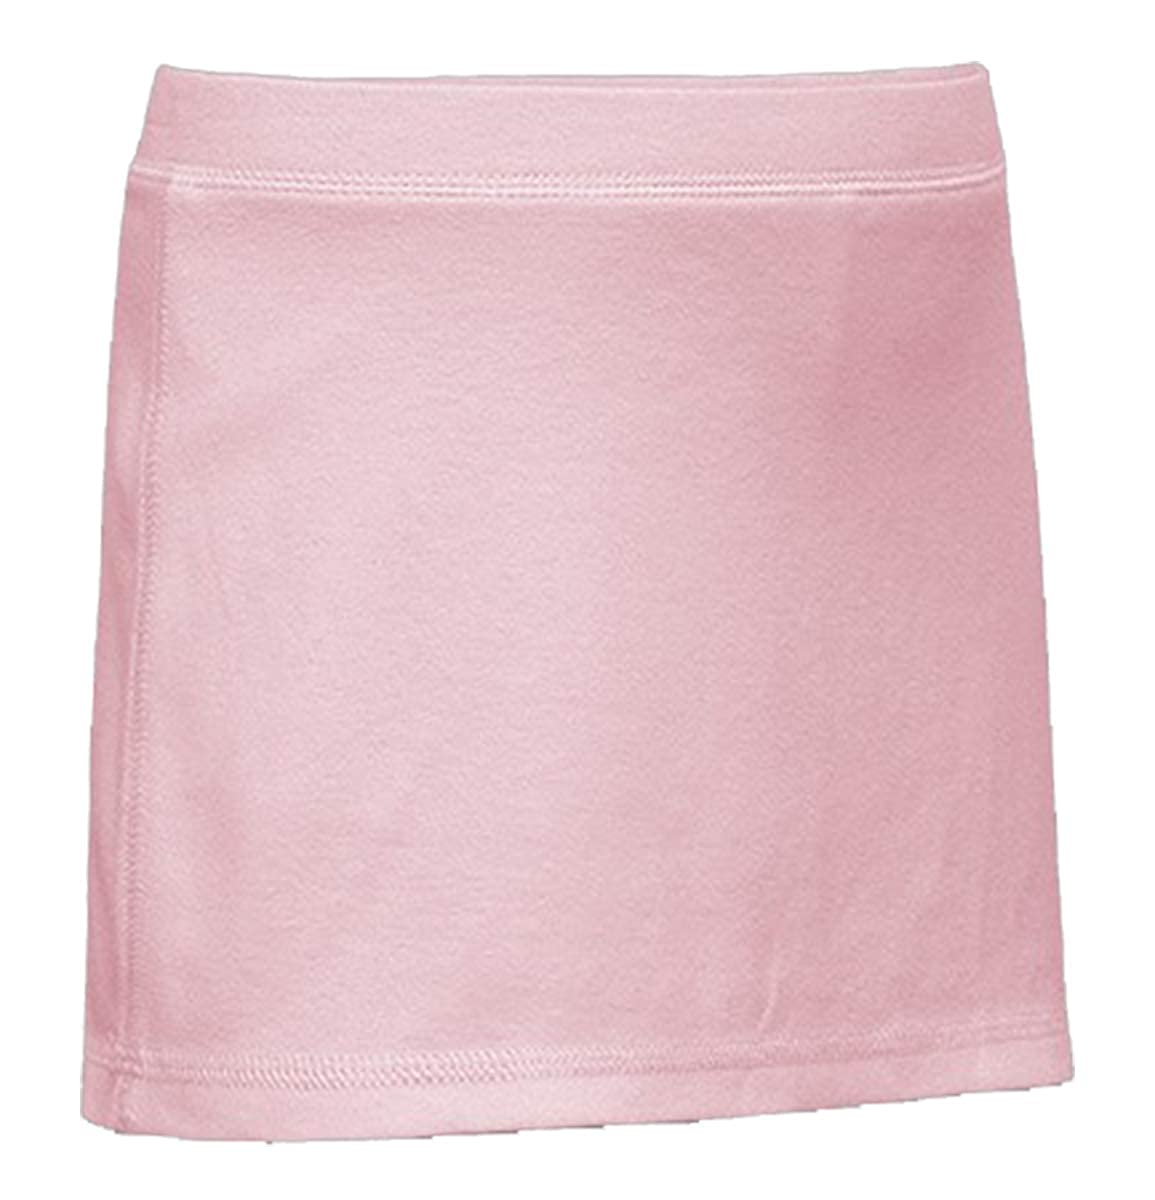 Baby Pink Kavio Big Girls 7-16 Yoga Skort Large G1C0206